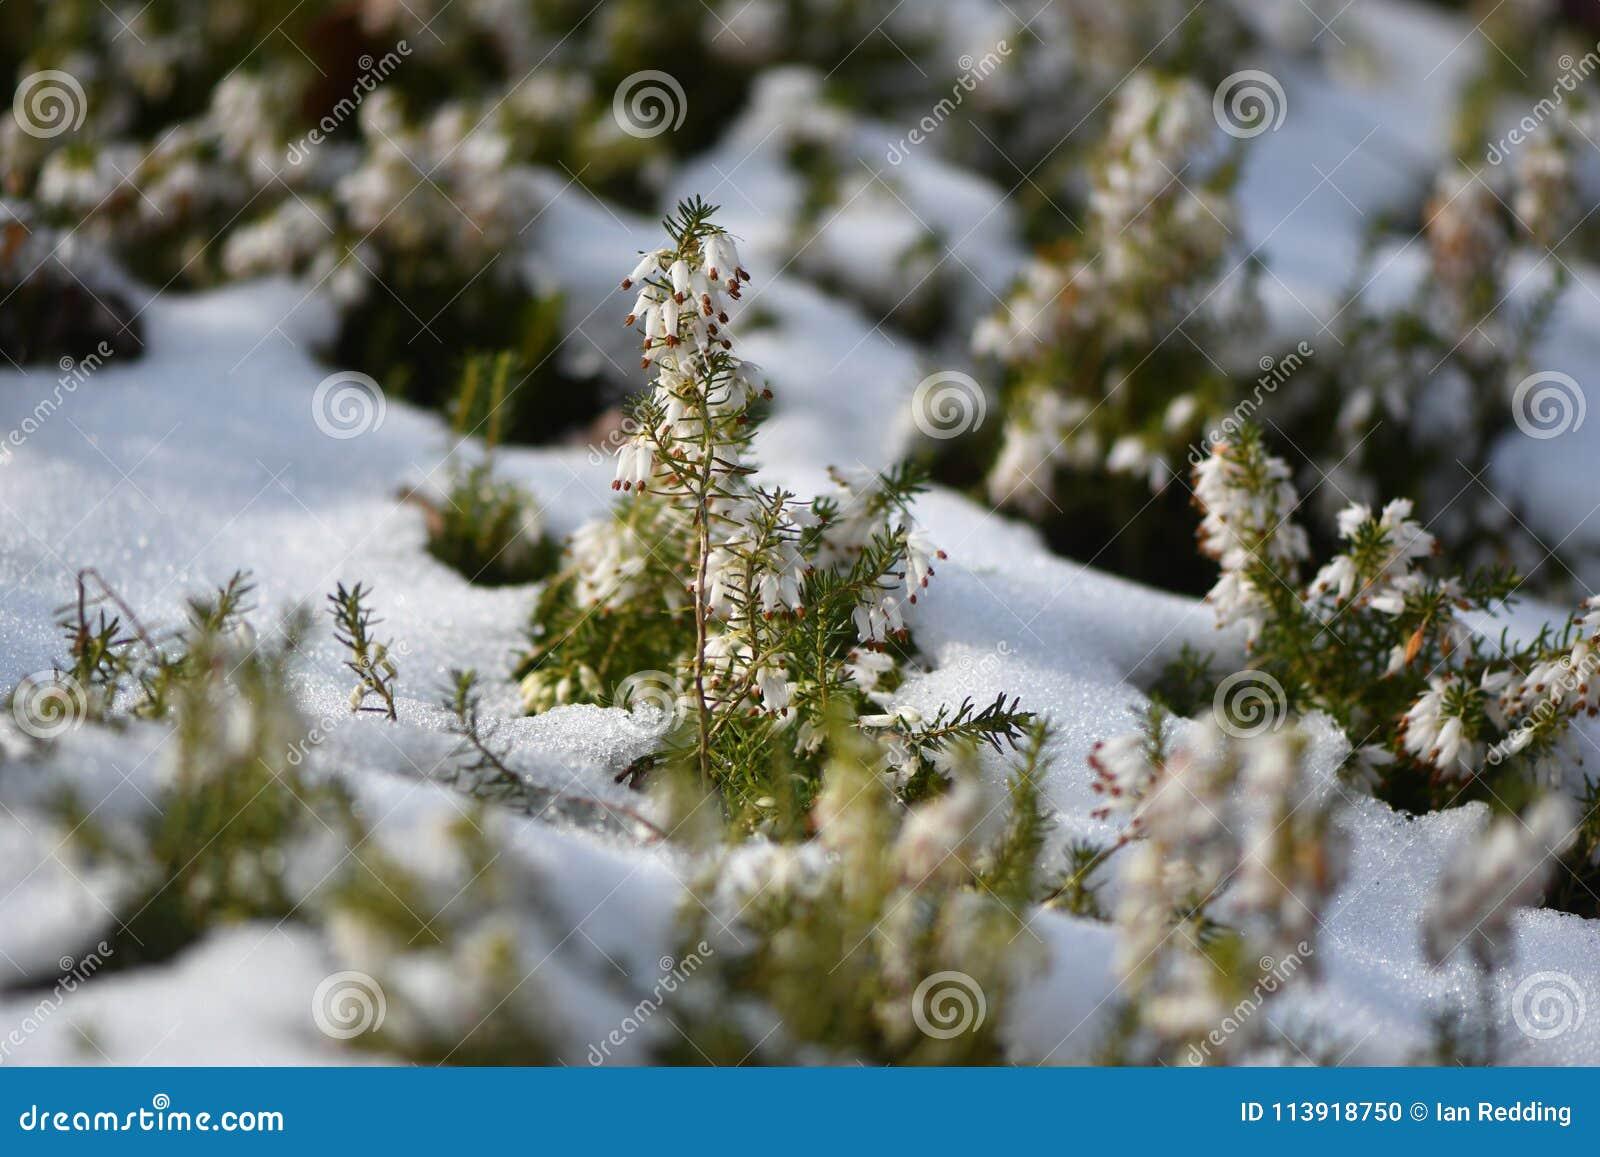 White Heather X28erica Sp X29 Flowering In The Snow Stock